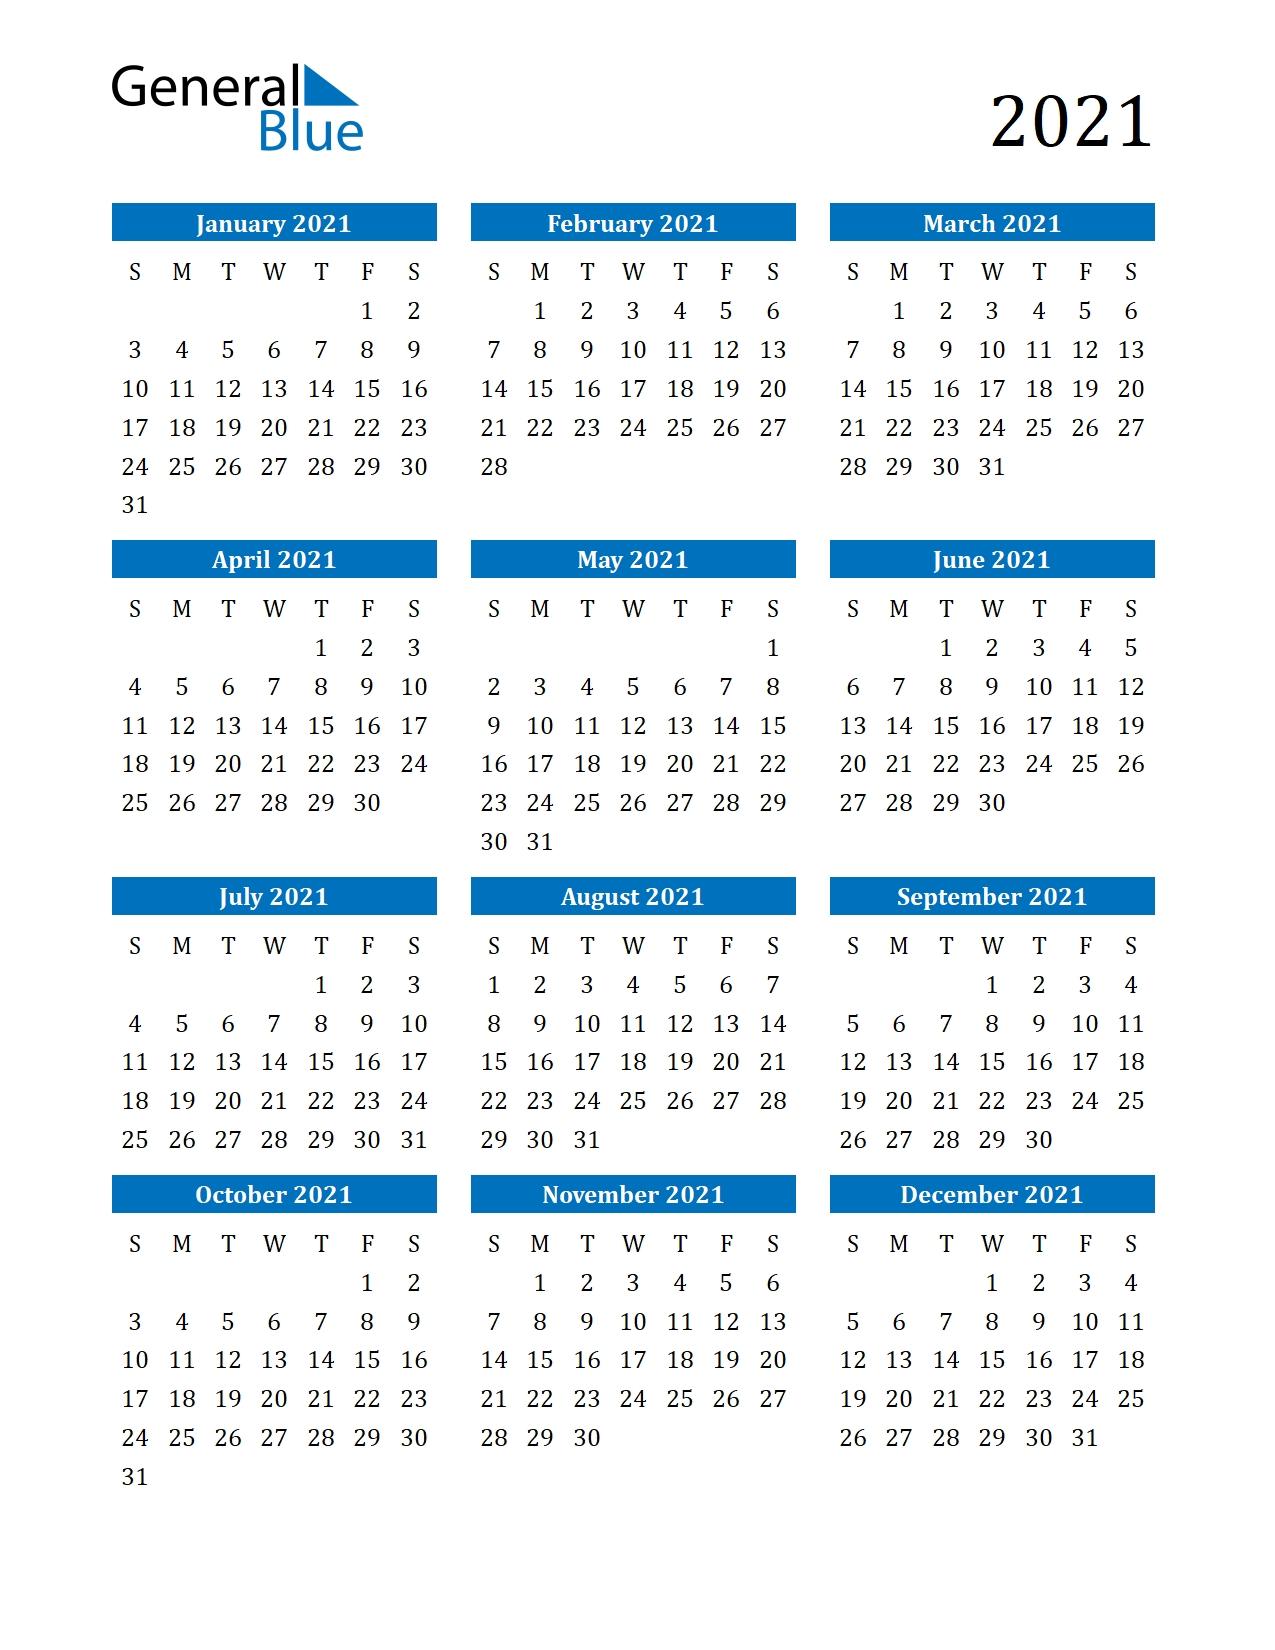 Free Printable Calendar In Pdf, Word And Excel regarding Microsoft Photo Calender 2021 Graphics